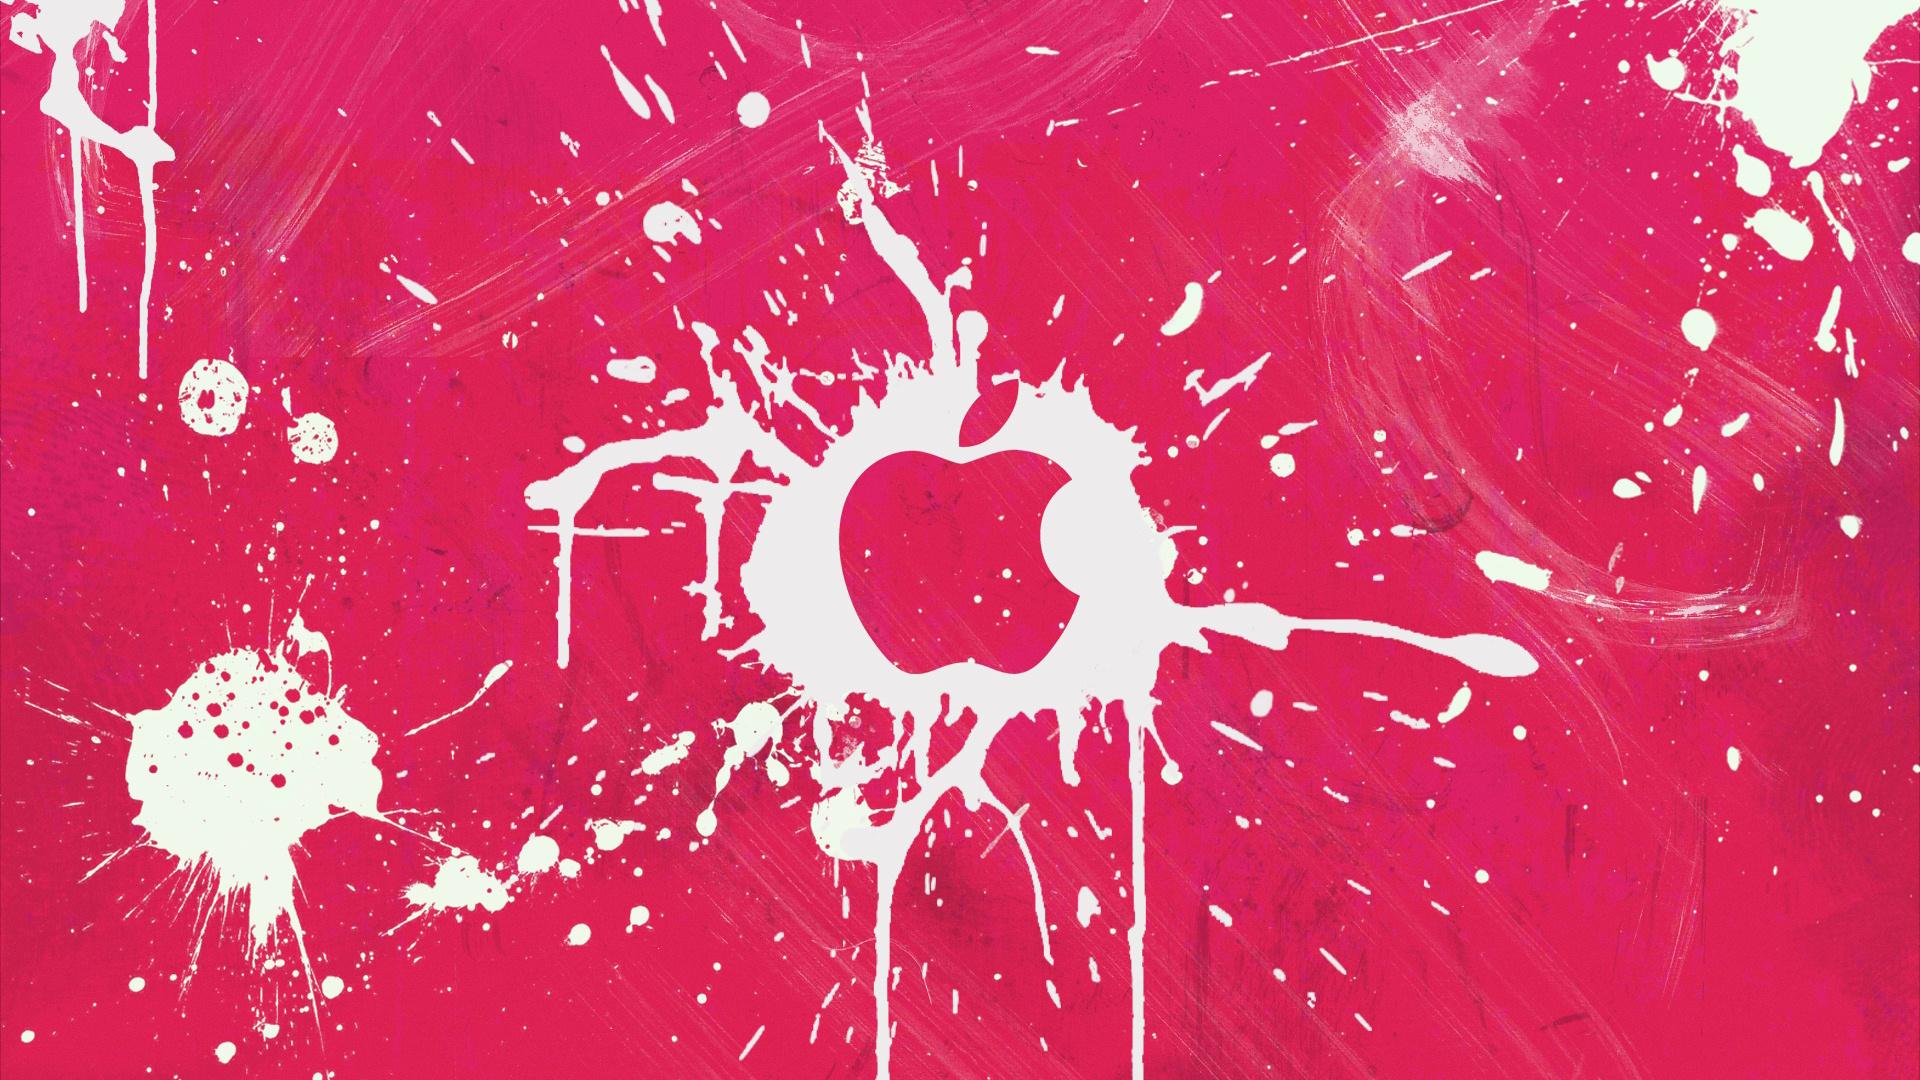 pink walpaper splash wallpaper   ForWallpapercom 1920x1080